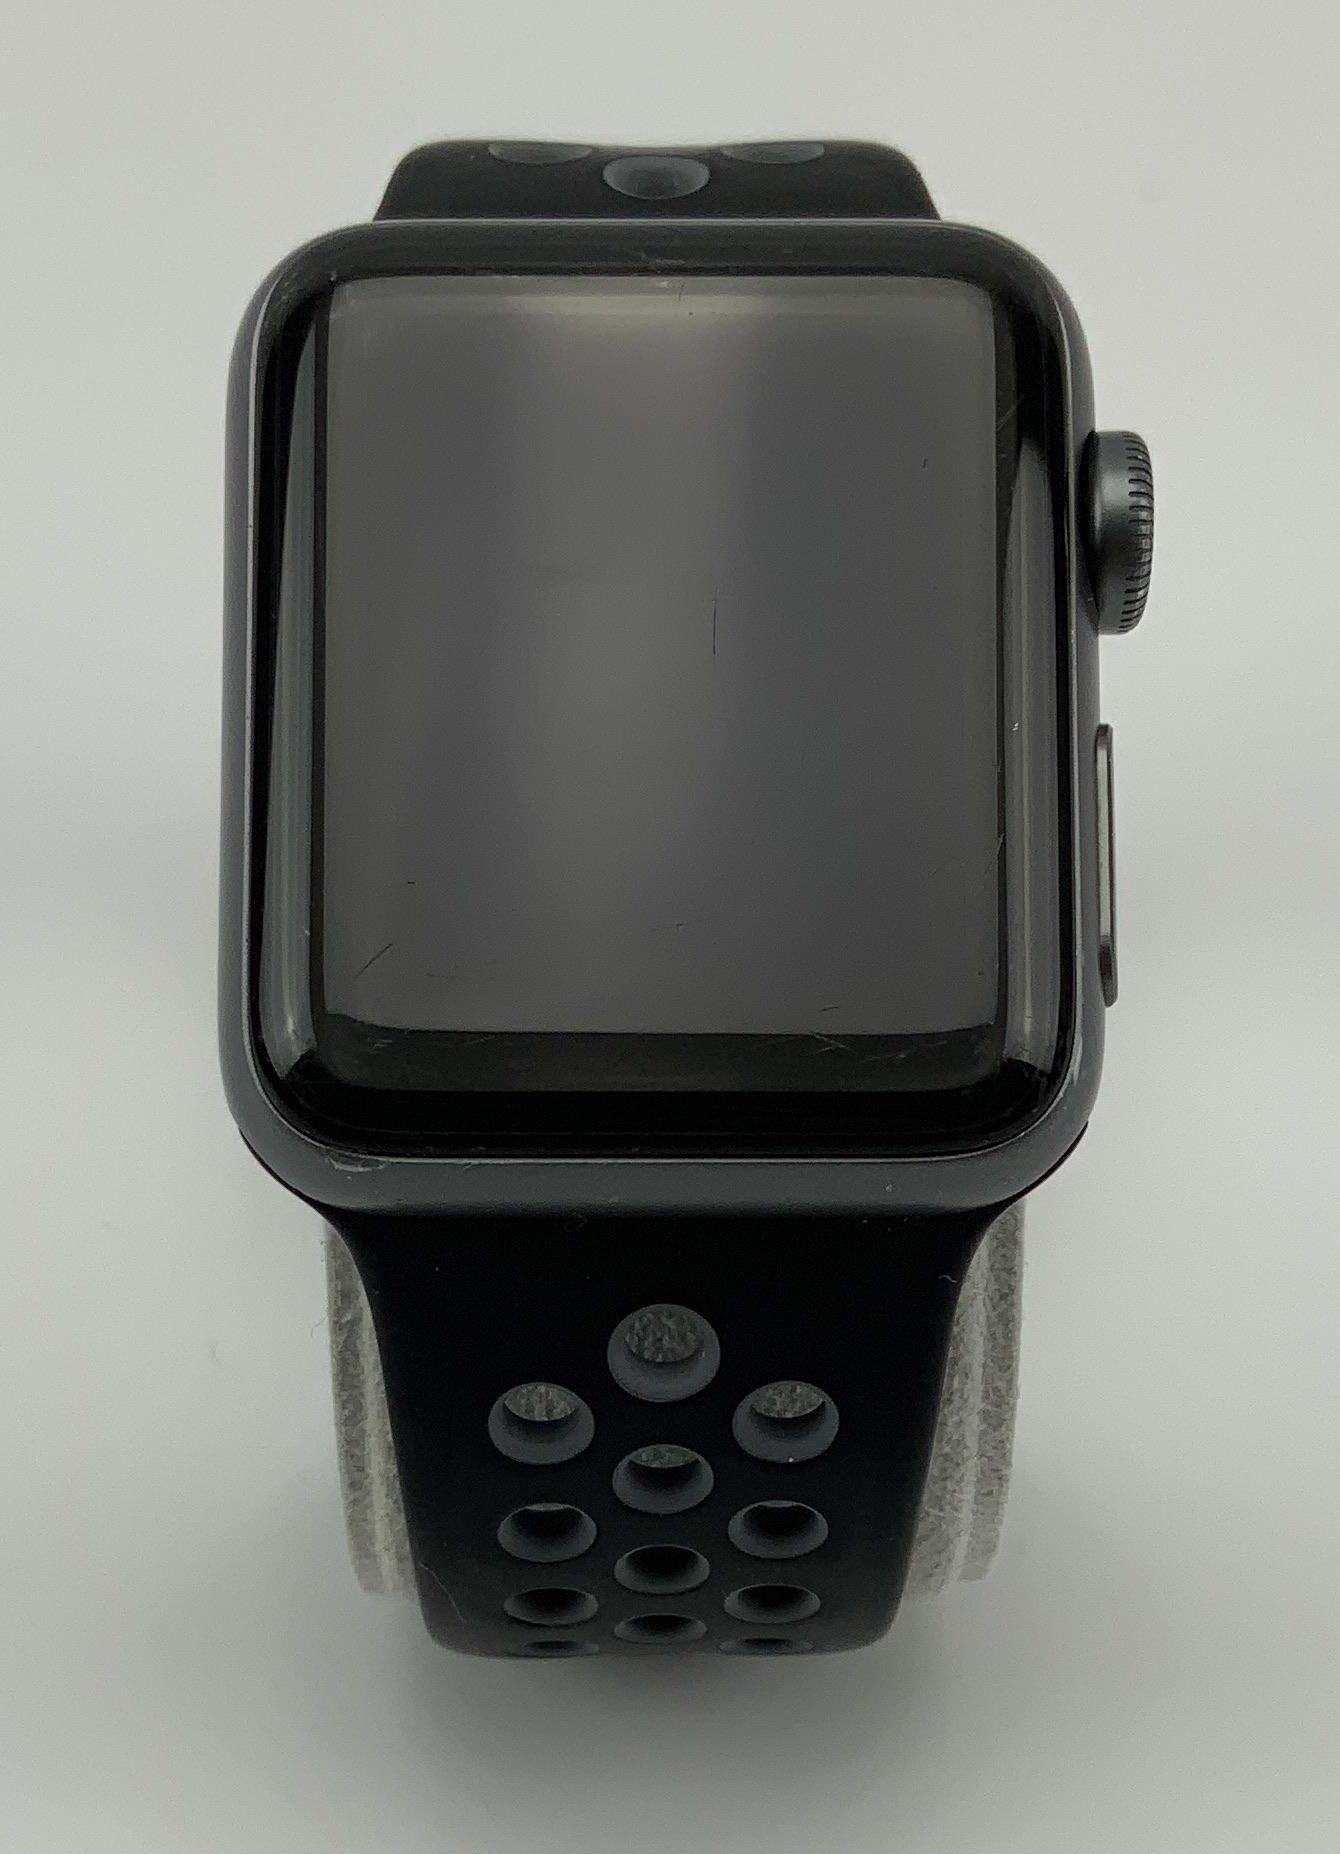 Watch Series 2 Aluminum (38mm), Space Gray, Anthracite/Black Nike Sport Band, Kuva 1